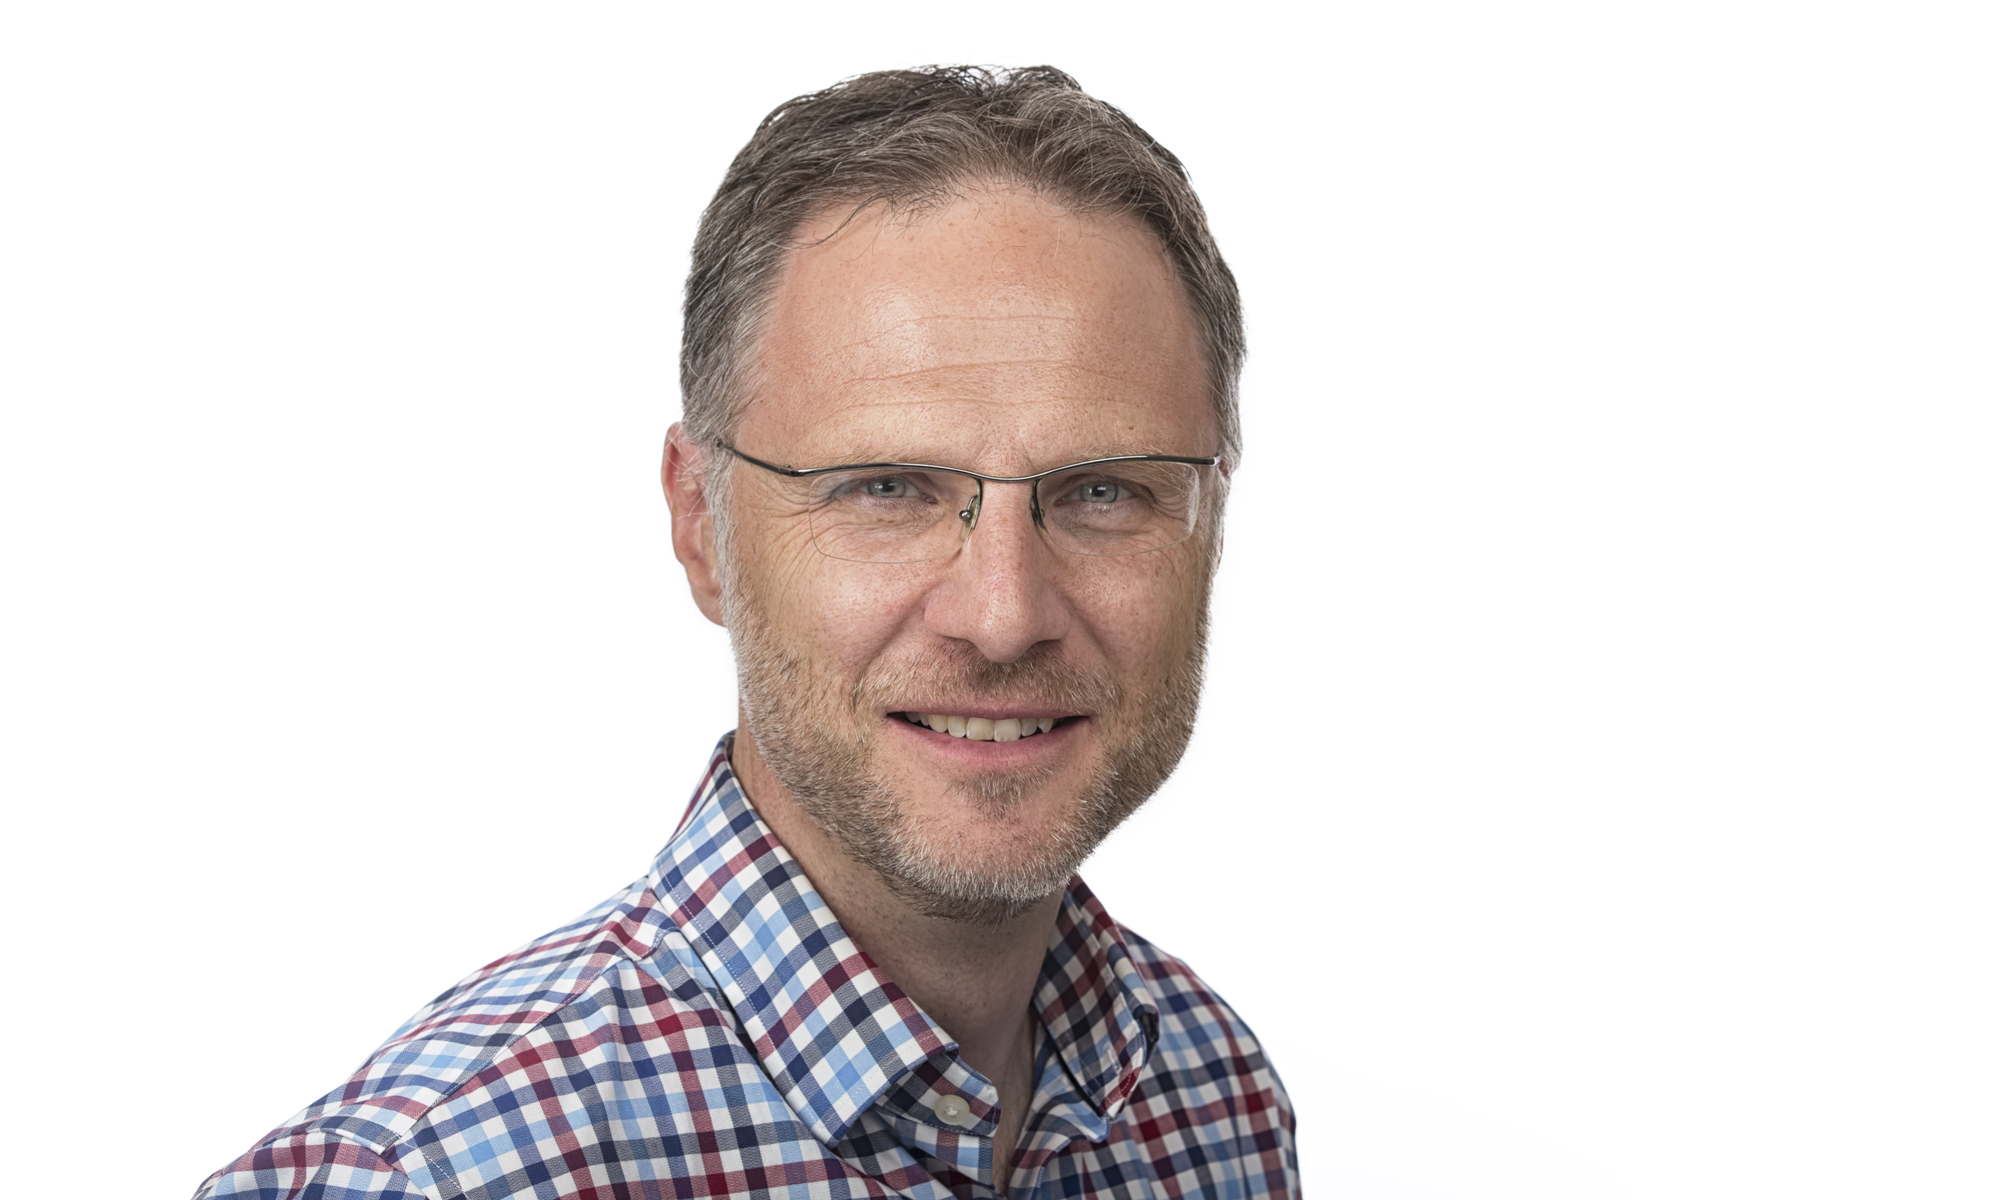 Tim Hoare